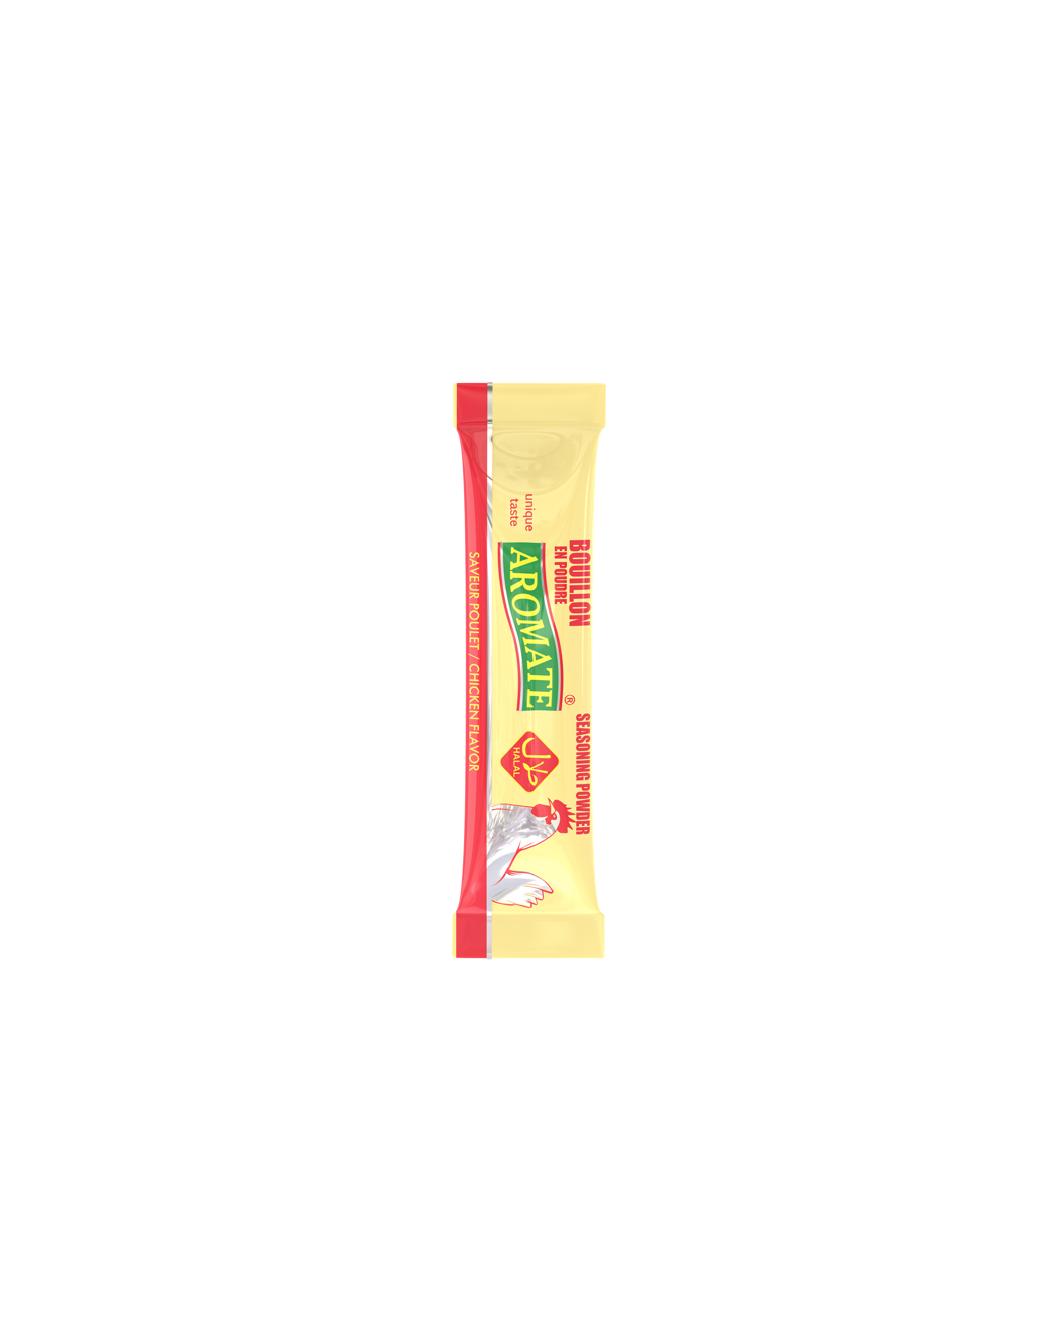 Bouillon AROMATE_Poulet Stick 15g_Siprochim